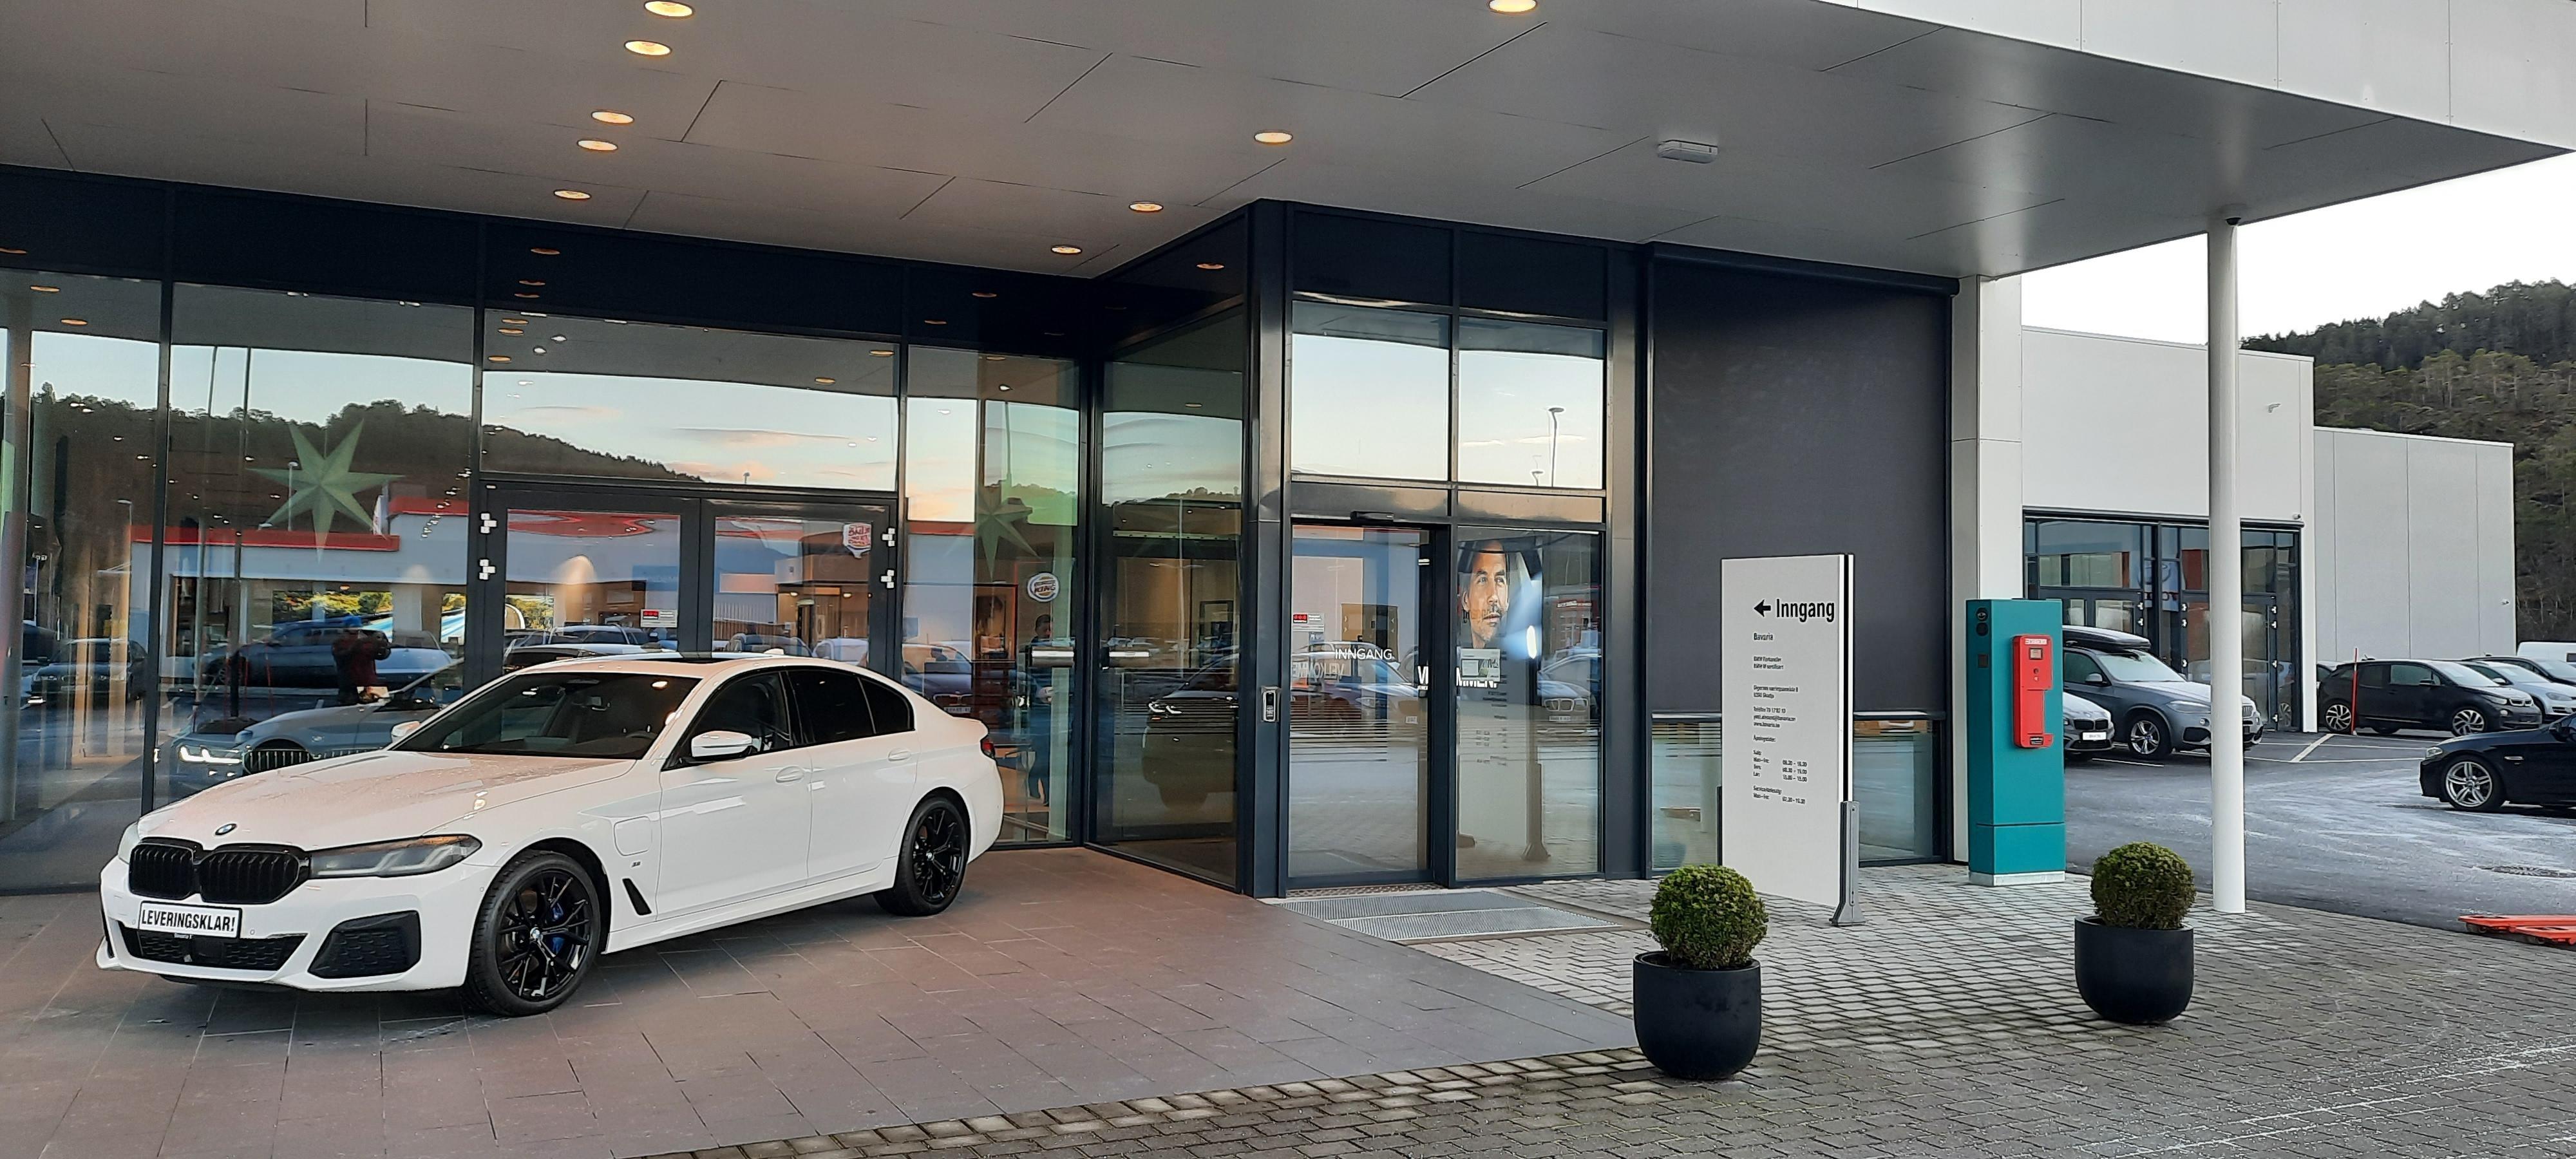 613, 063A1, Bavaria Ålesund, Entrance-2